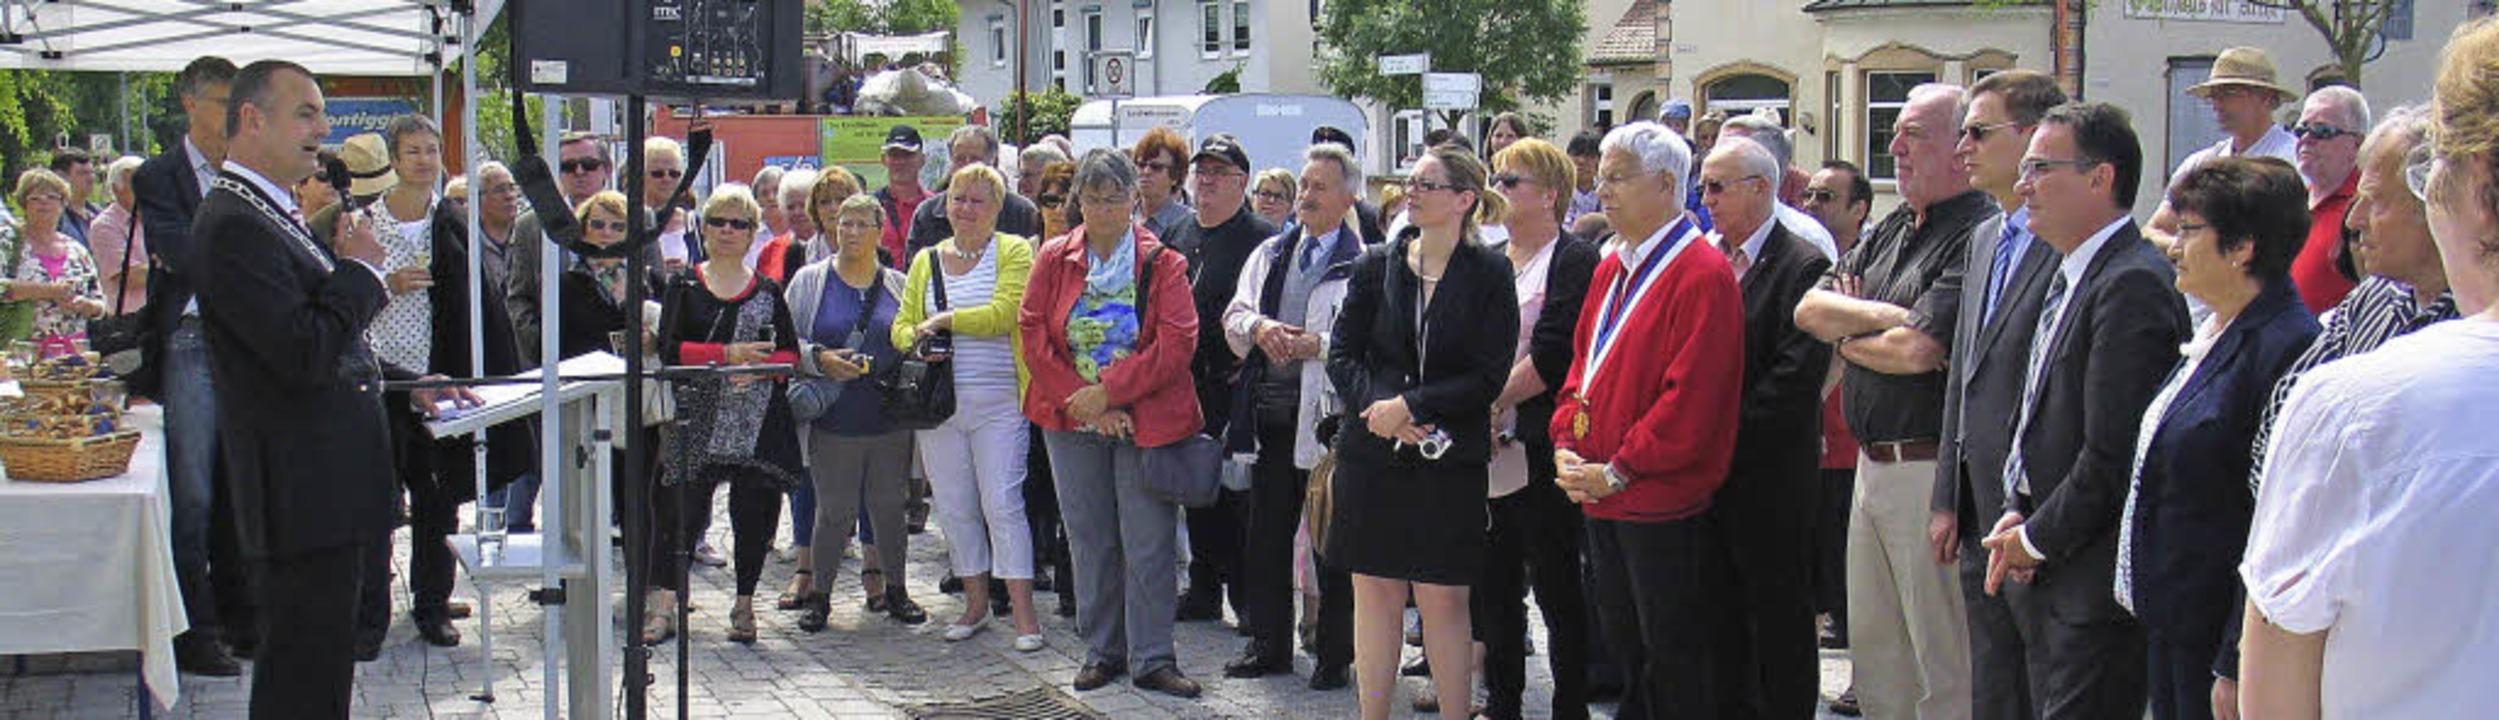 Festakt mit Freunden:  Riegels Bürgerm...nweihung des neuen Champhol-Platzes.    | Foto: Helmut Hassler